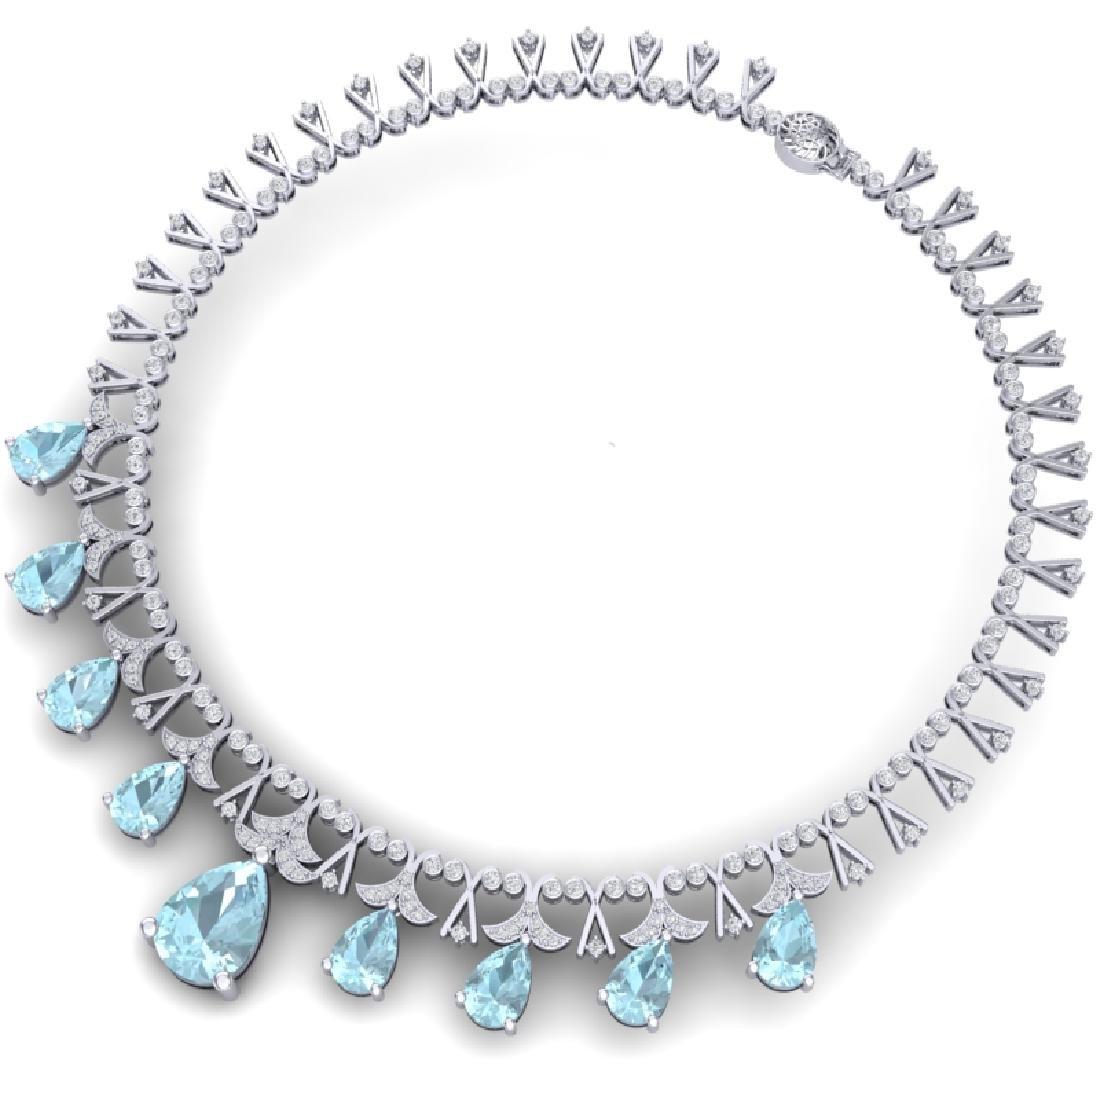 60.62 CTW Royalty Sky Topaz & VS Diamond Necklace 18K - 3